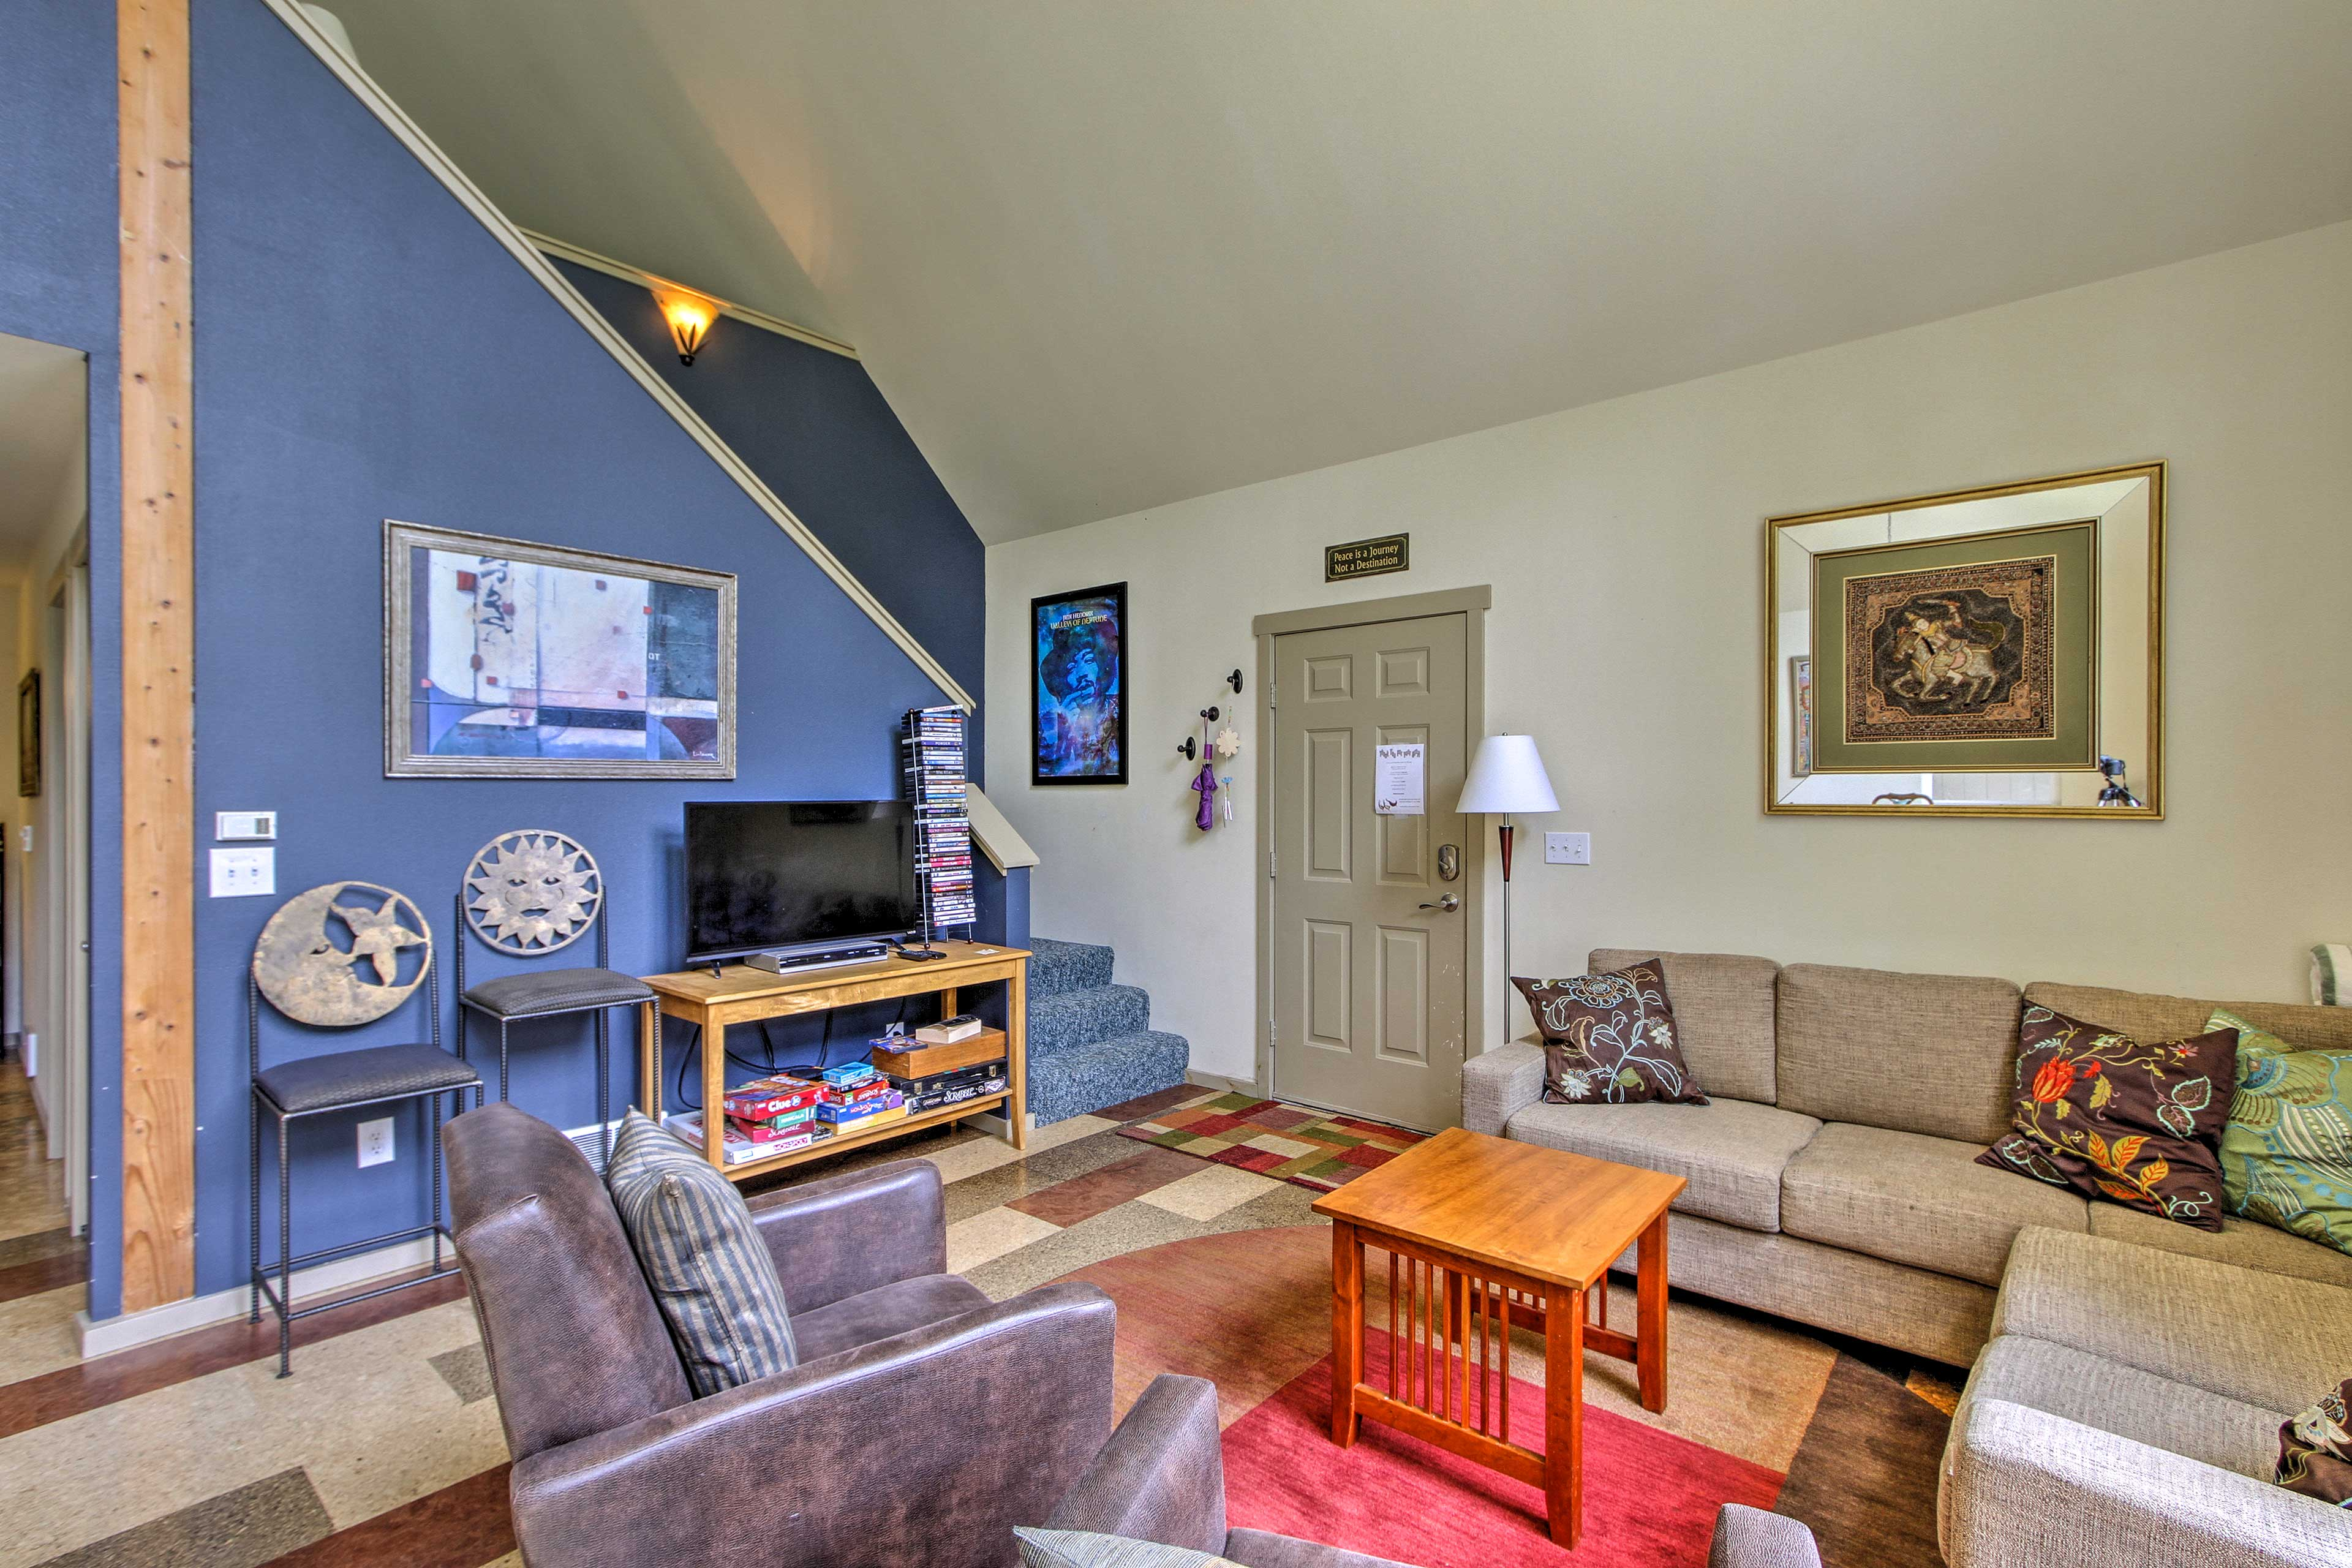 Contemporary furnishings fill the interior.